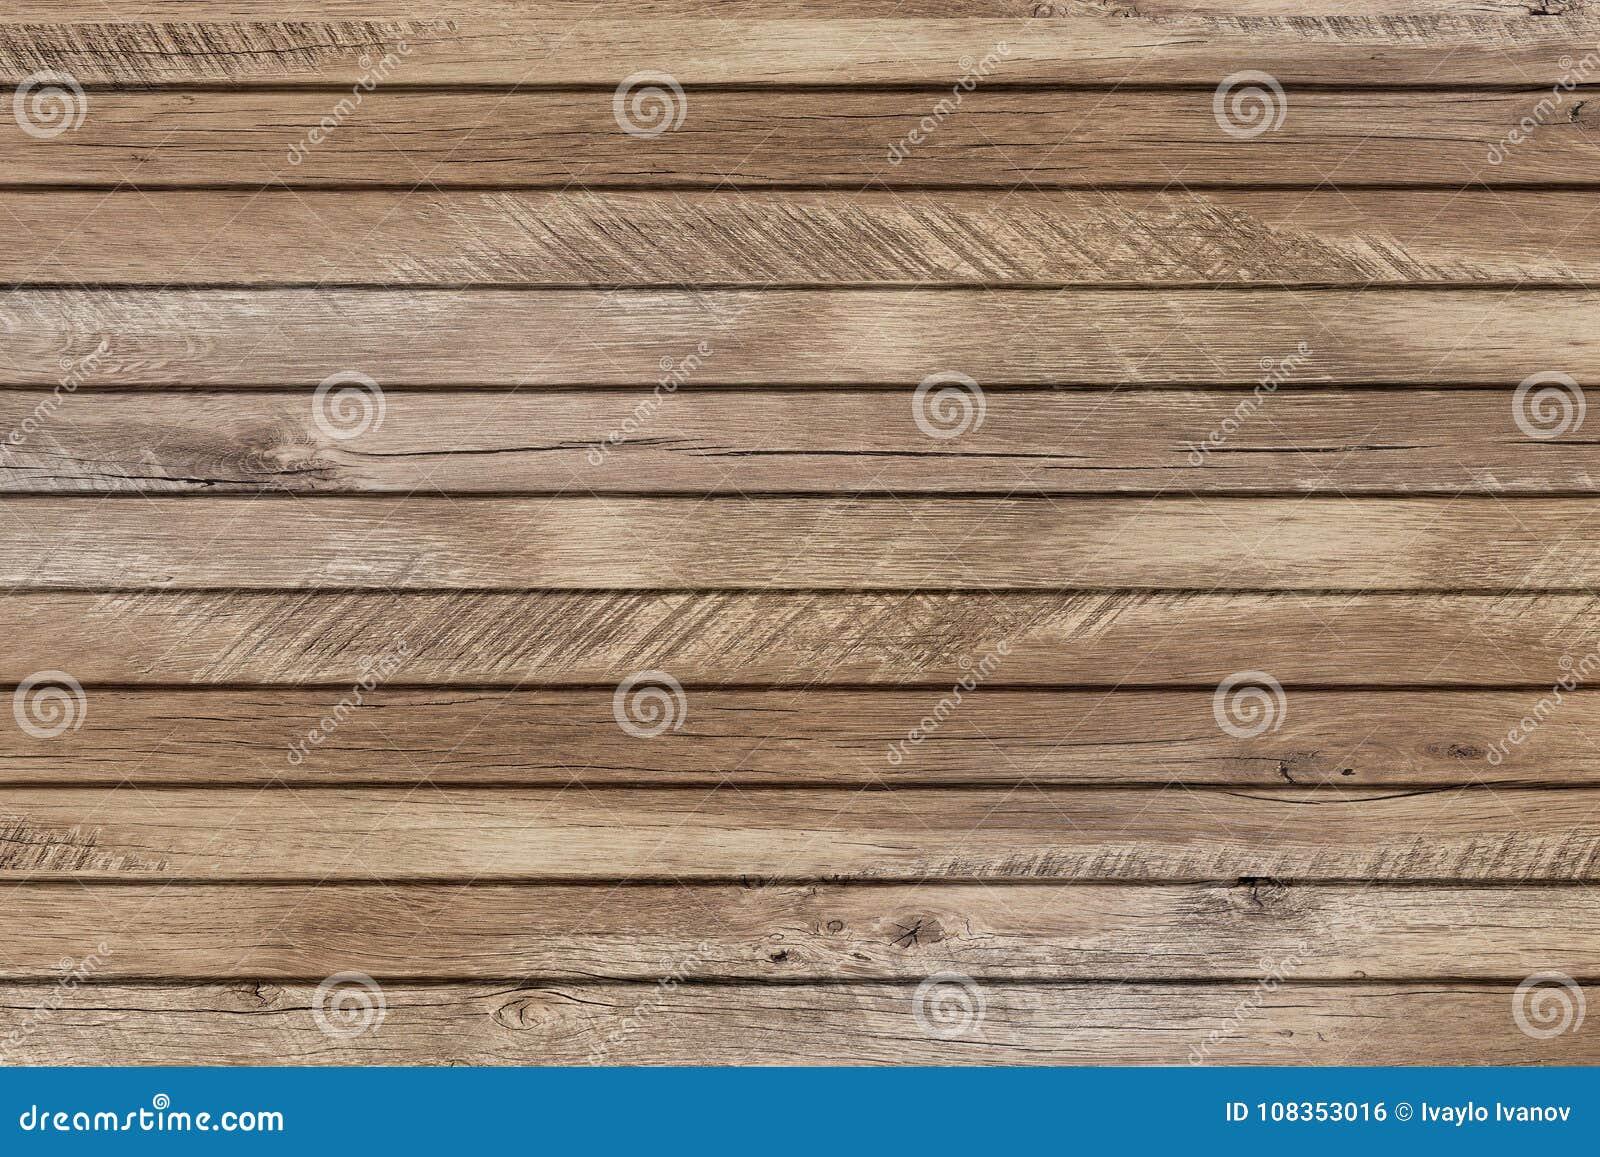 Grunge drewna wzoru tekstury tło, drewniane deski